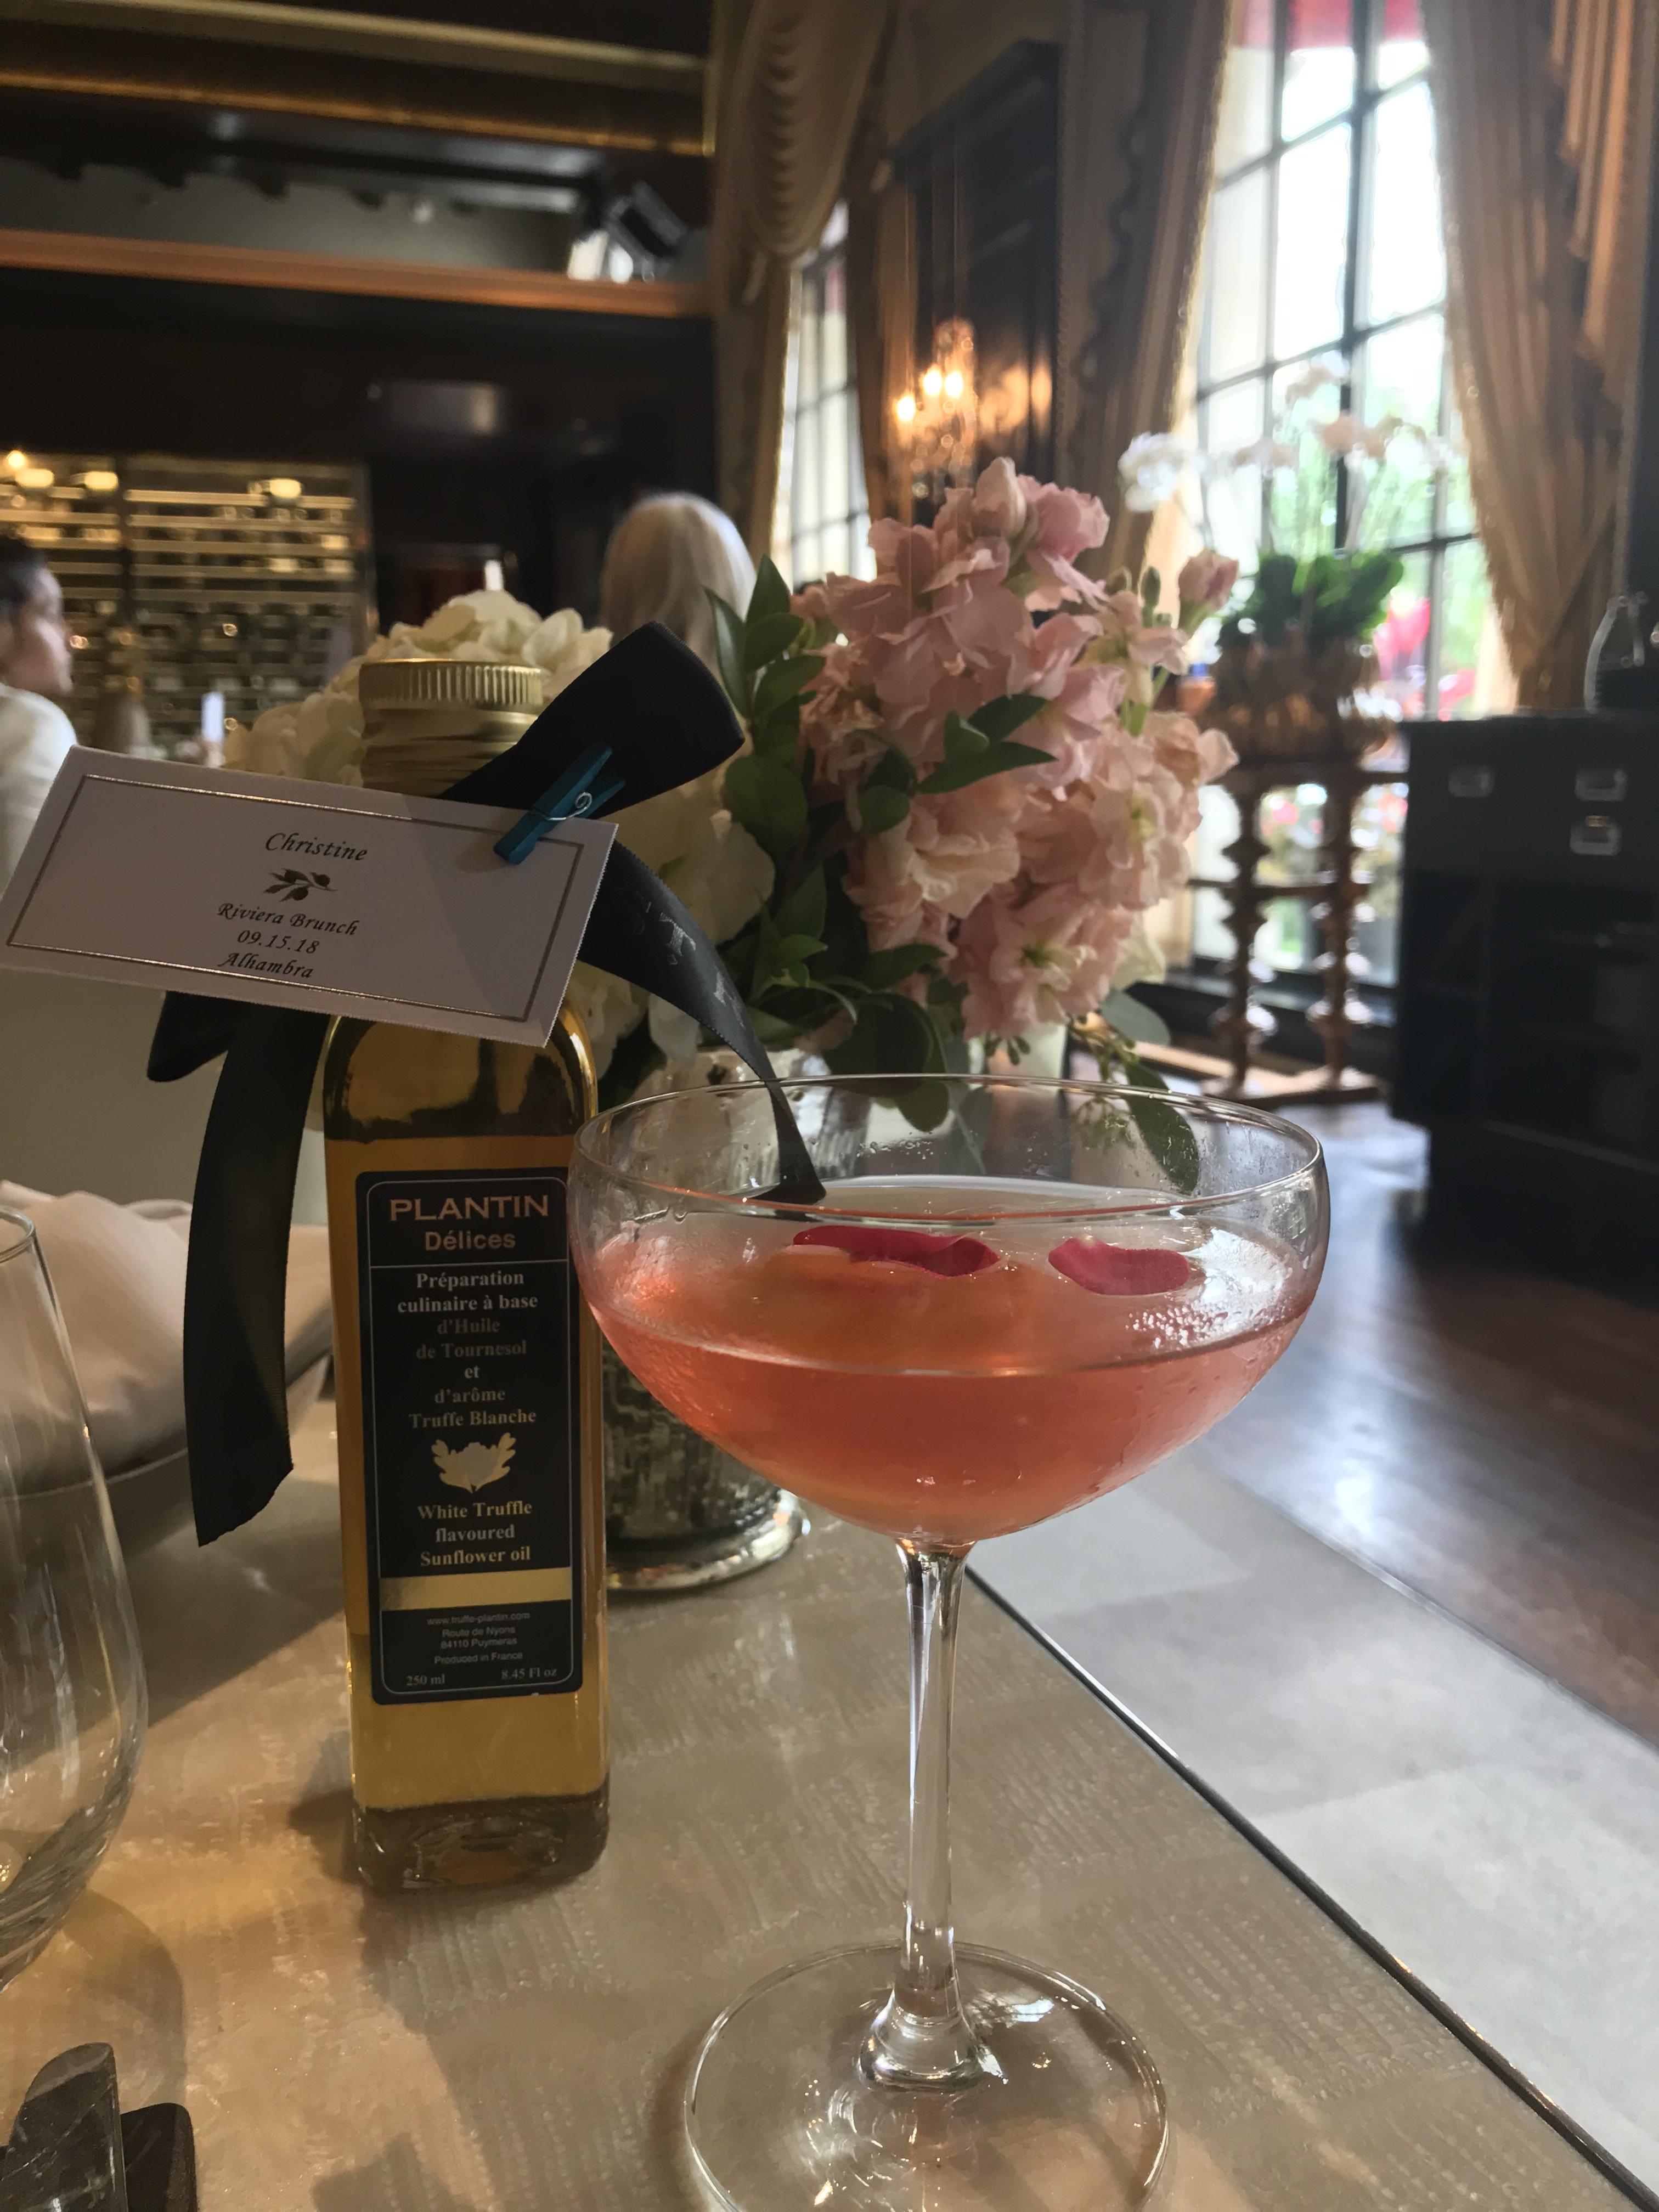 French Riviera Brunch at The St. Regis Alhambra Restaurant